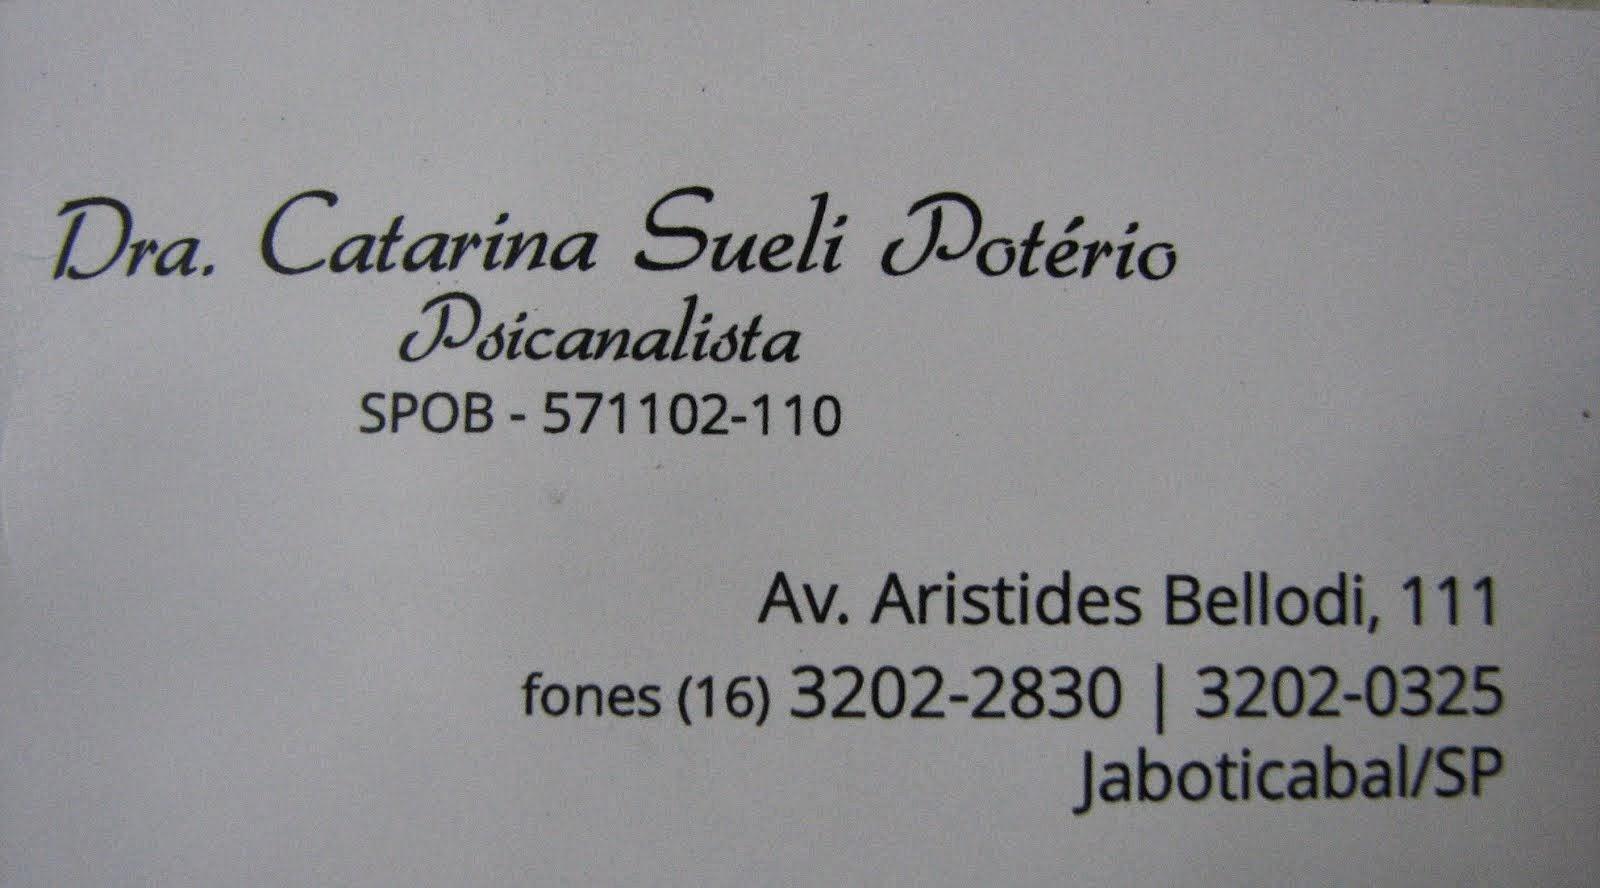 dra. catarina